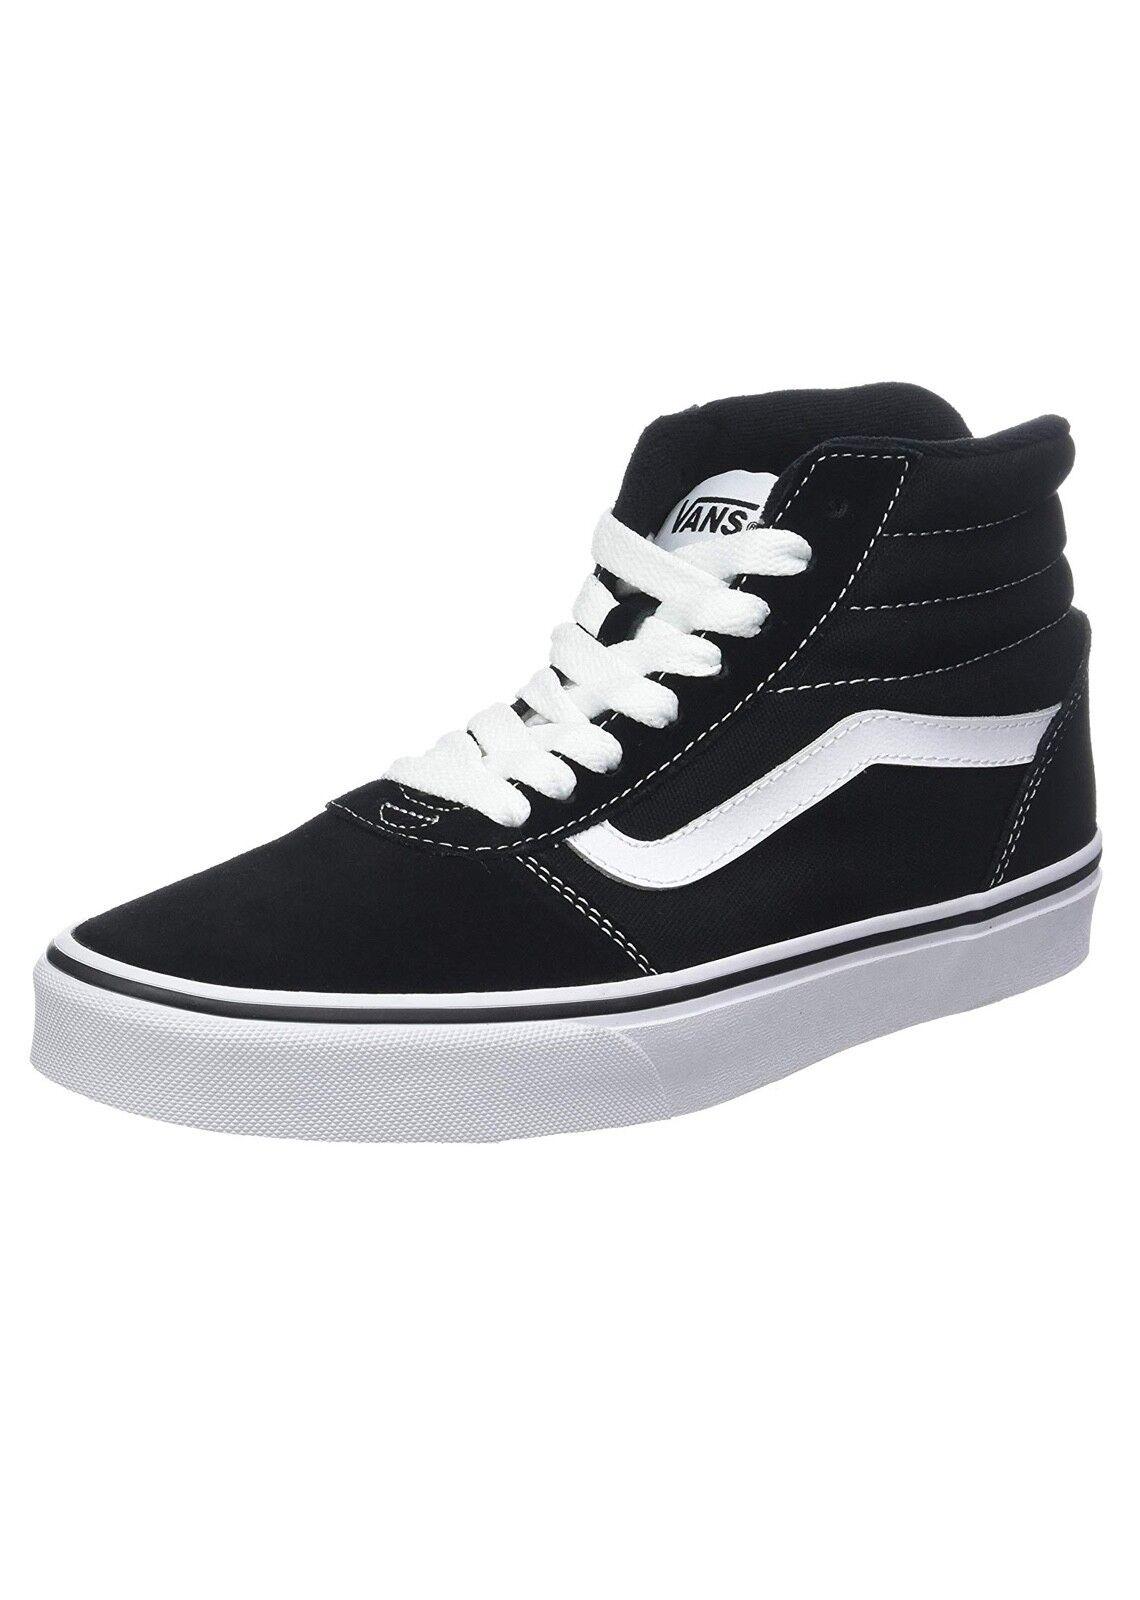 Vans Ward Hi Top A Righe Tela Camoscio Skater Scarpe Casual Nero Bianco